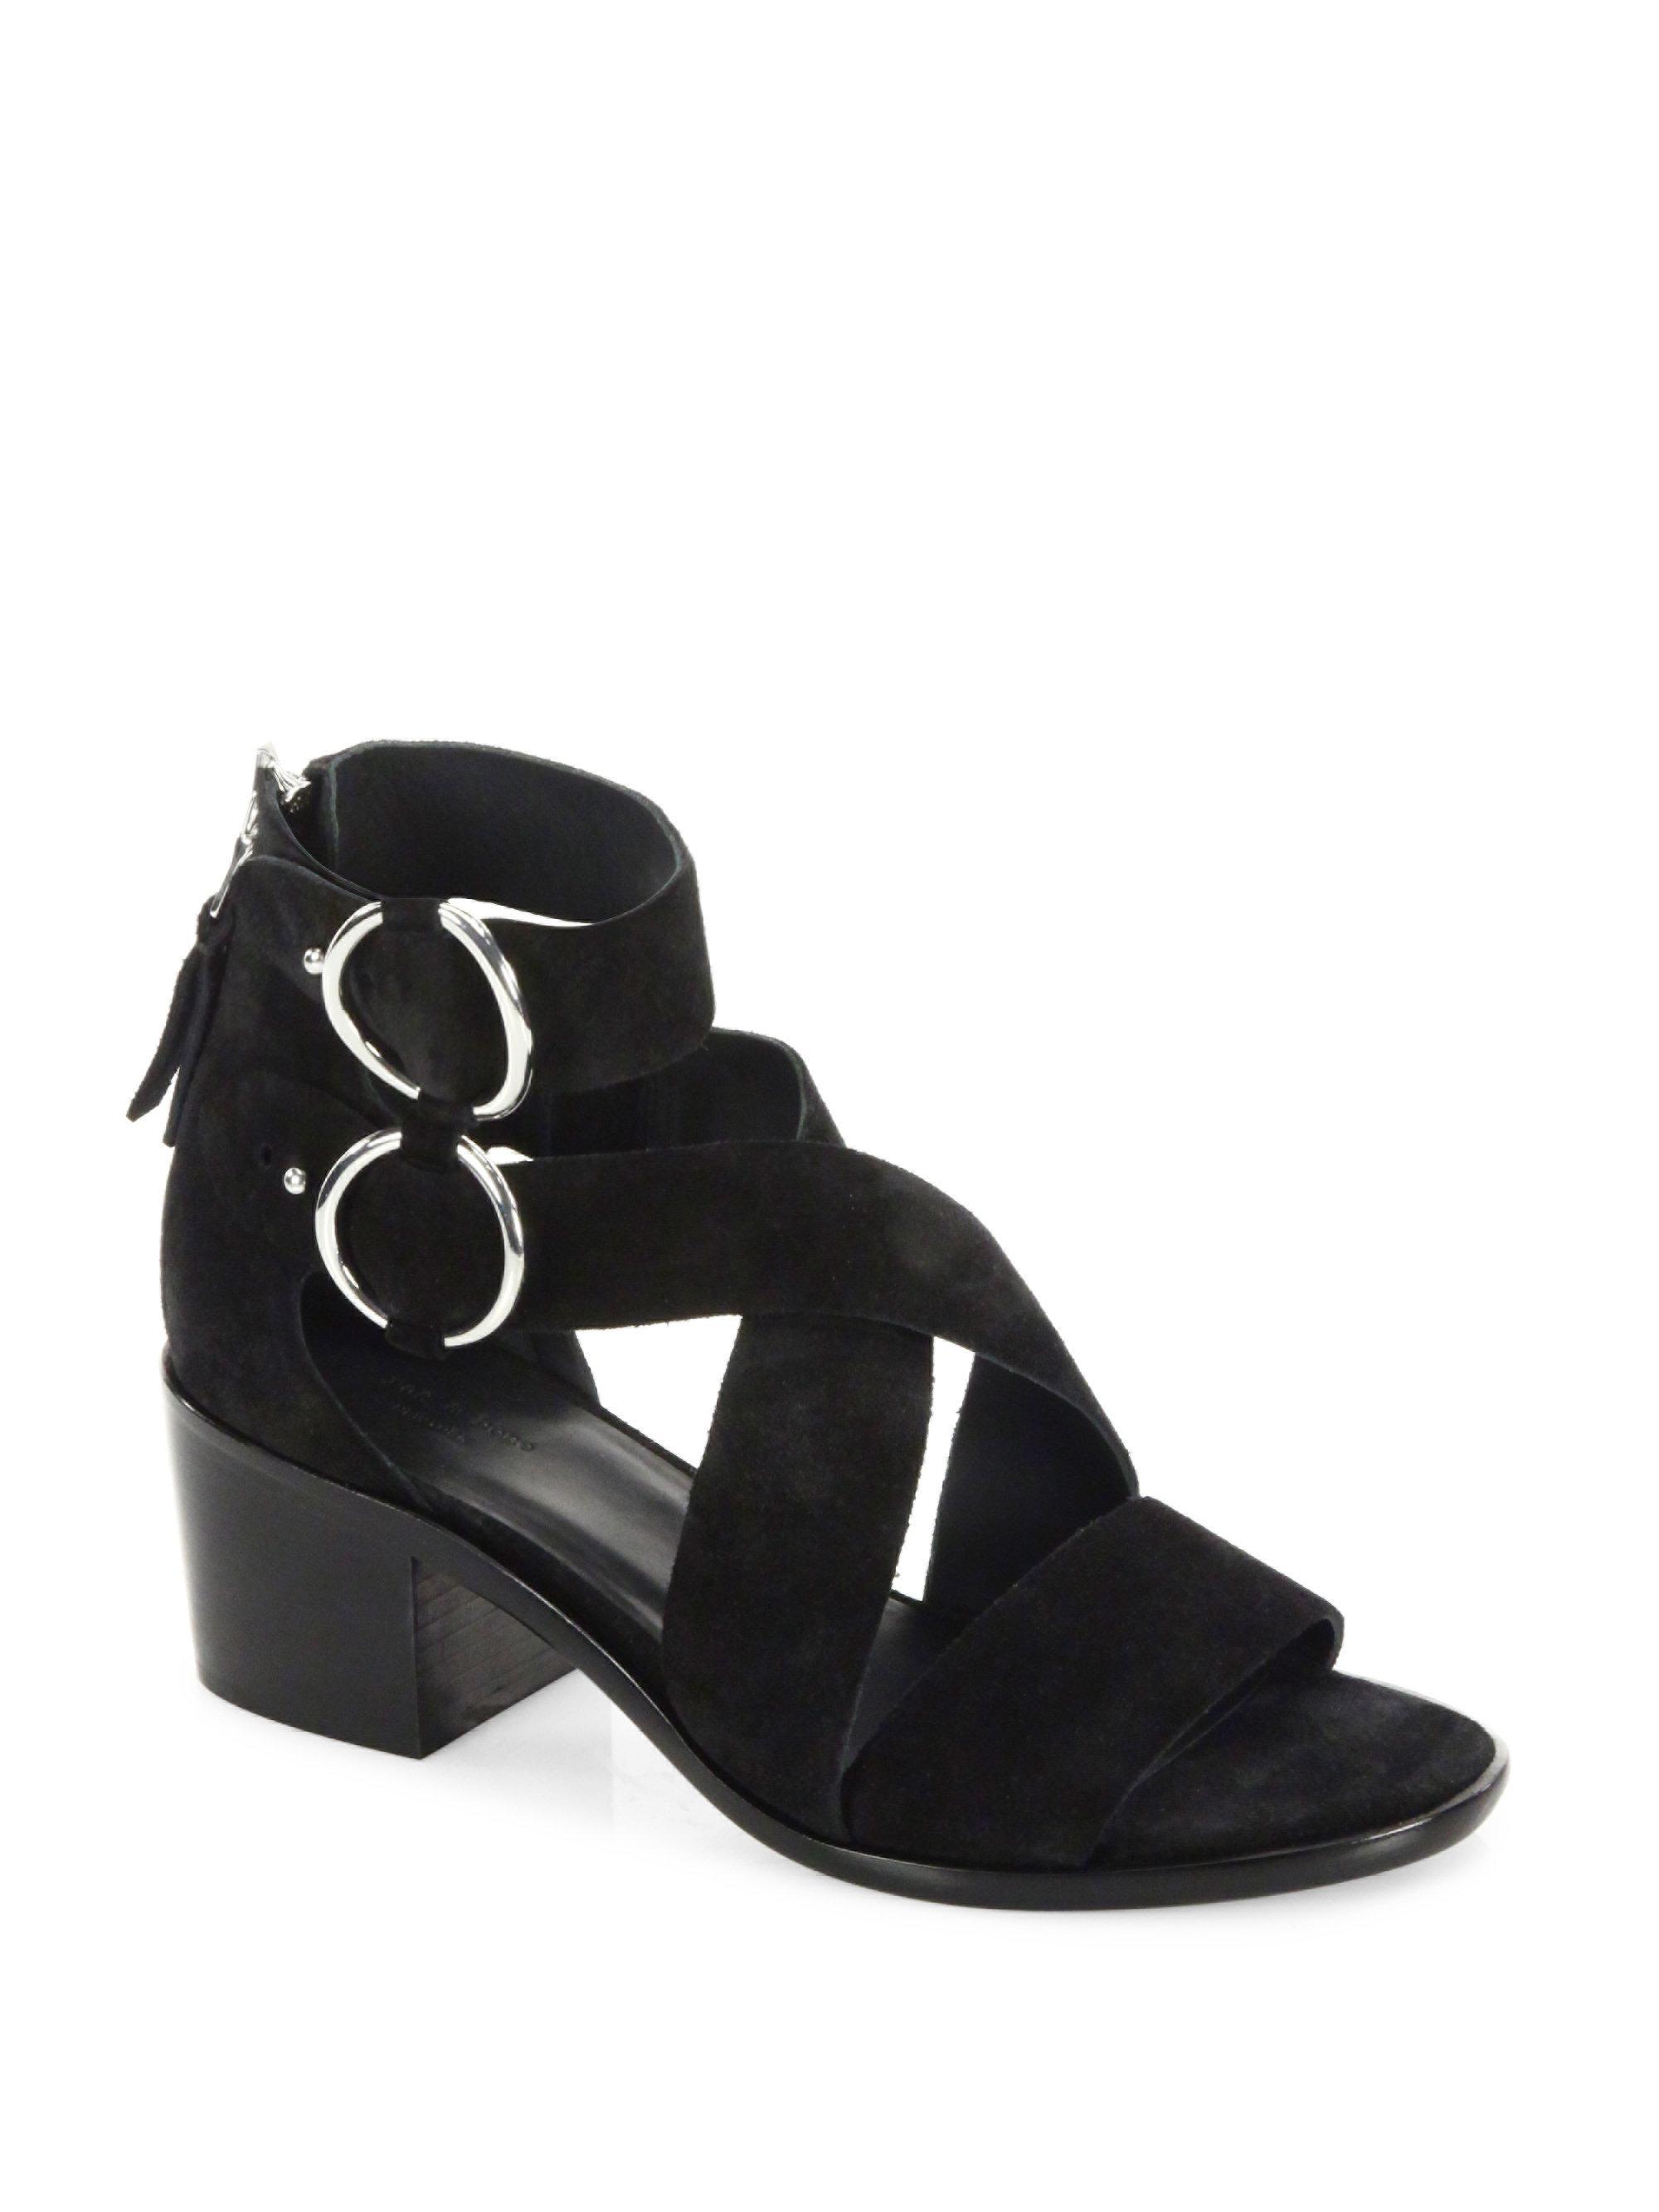 d10f93dad4690 Lyst - Rag   Bone Mari Suede Mid-heel Sandals in Black